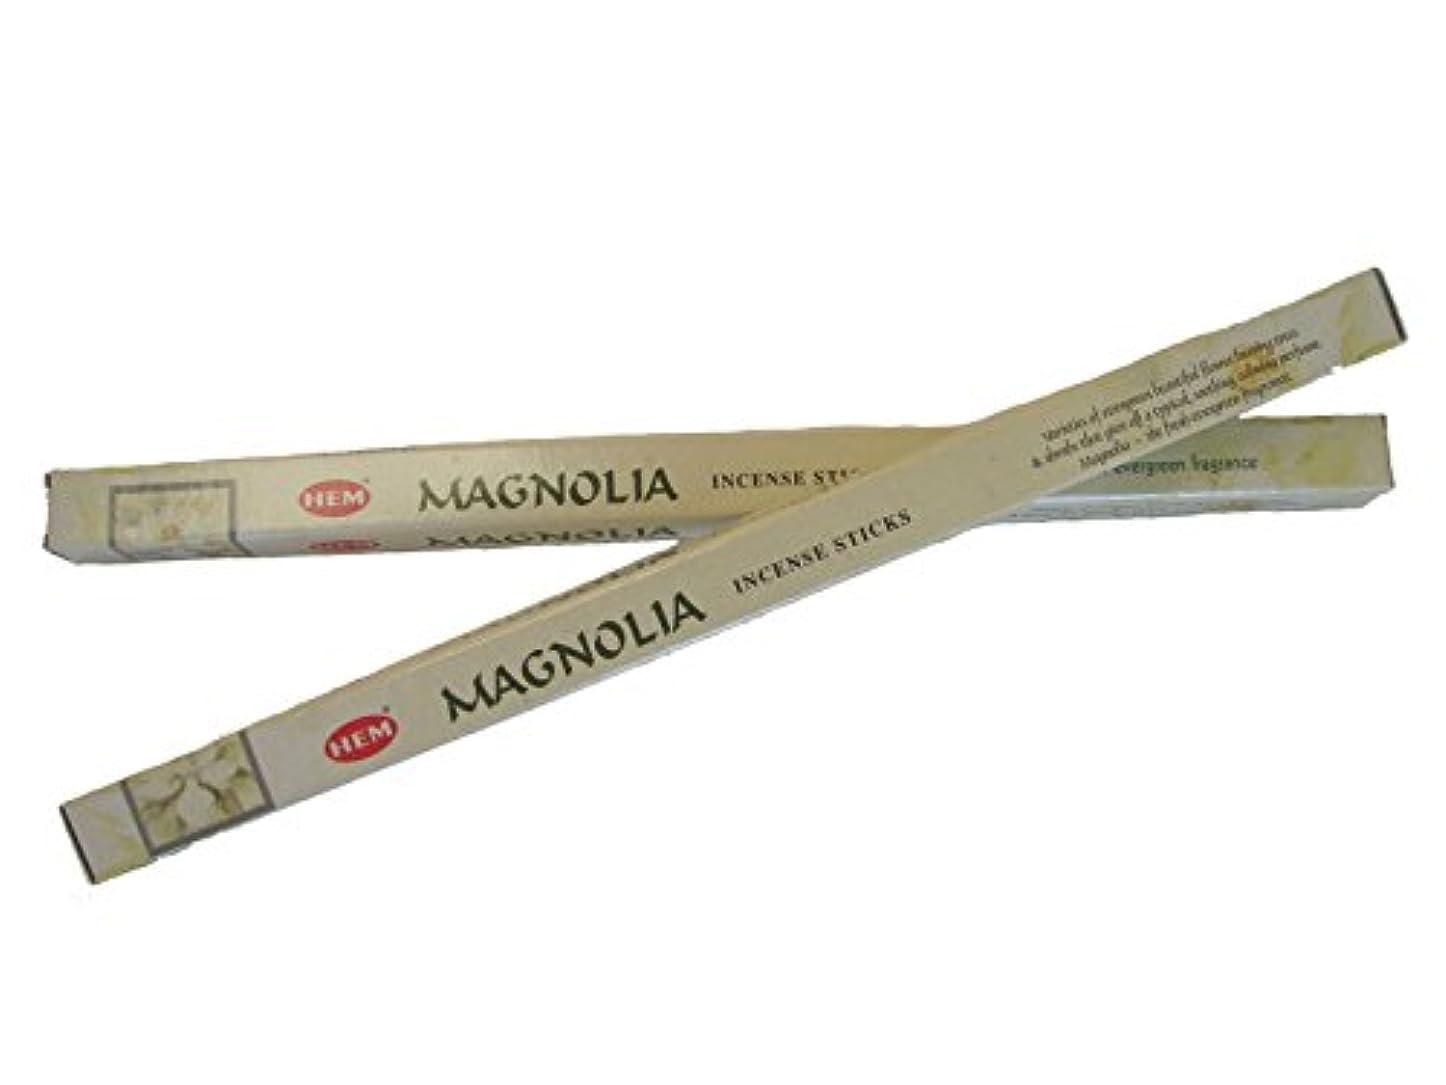 4 Boxes of Magnolia Incense Sticks